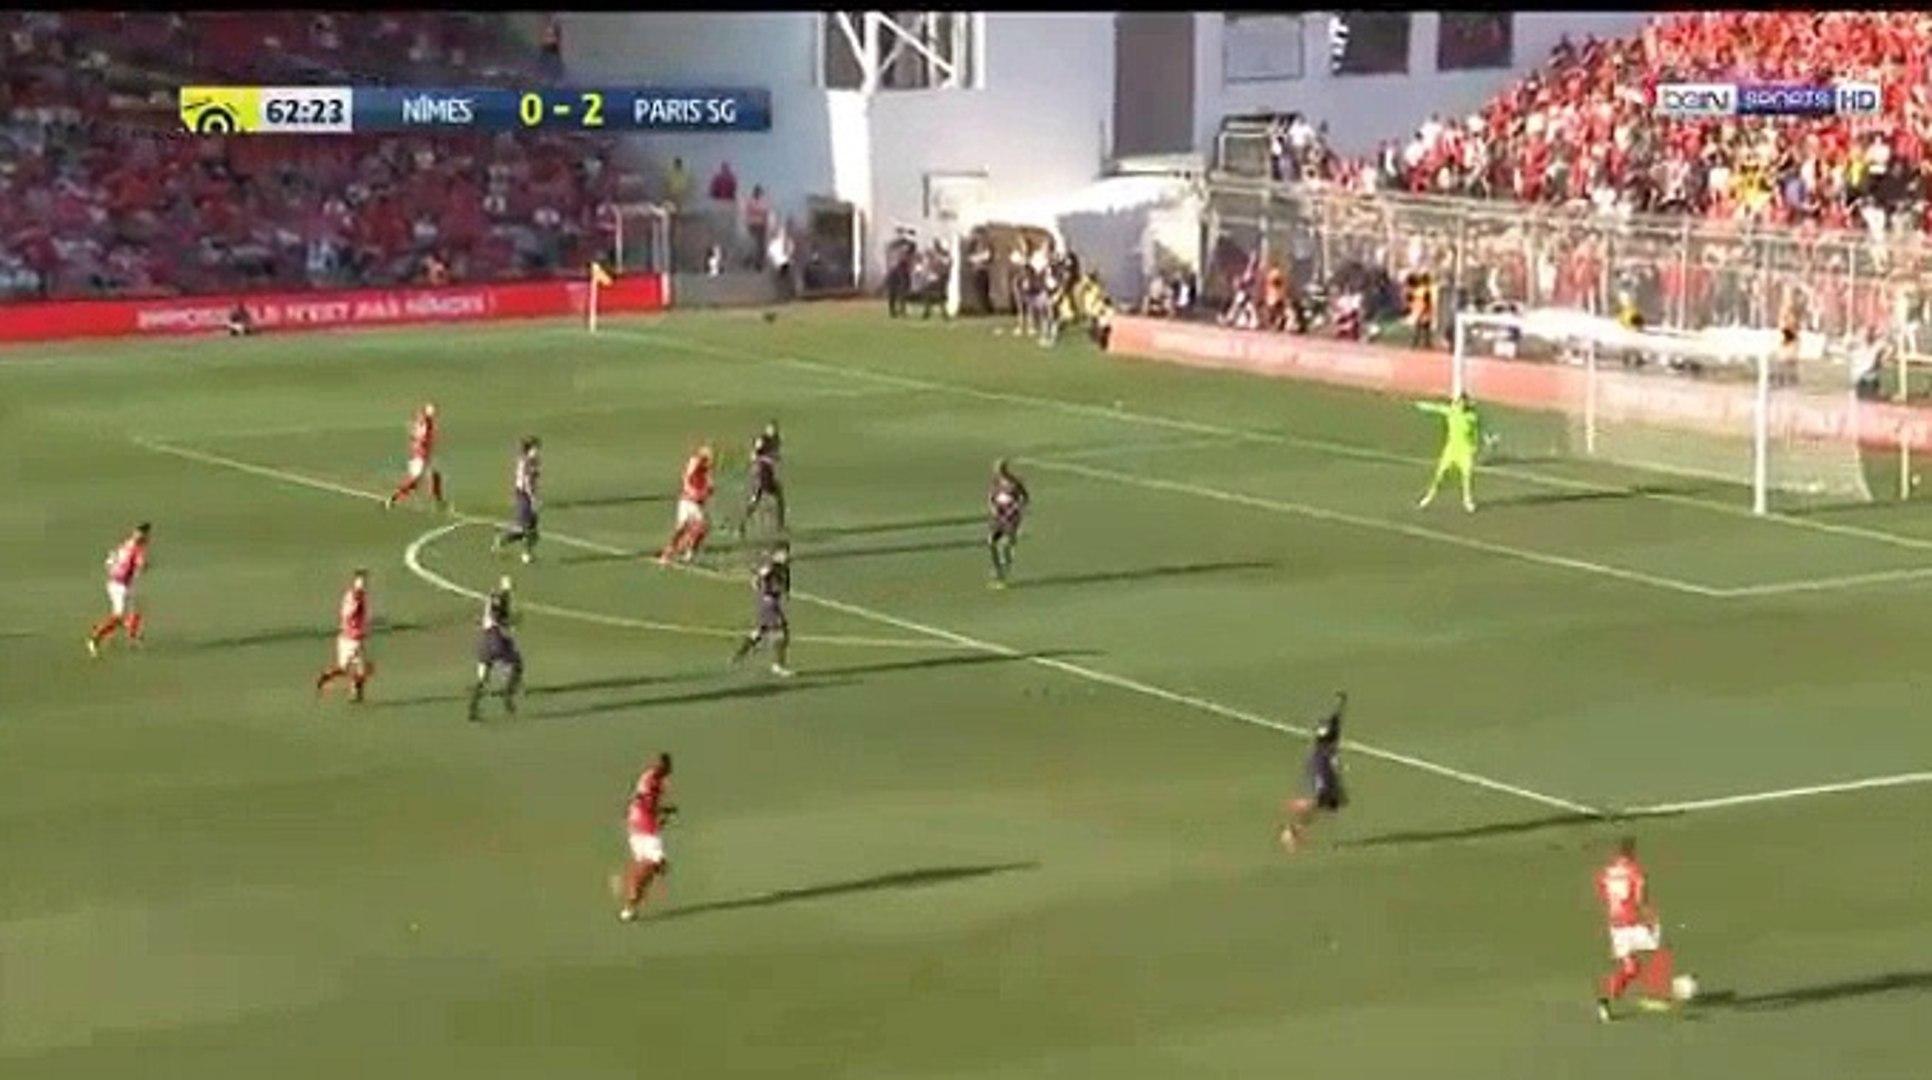 Antonin Bobichon Goal Hd Nimes 1 2 Paris Sg 01 09 2018 Video Dailymotion